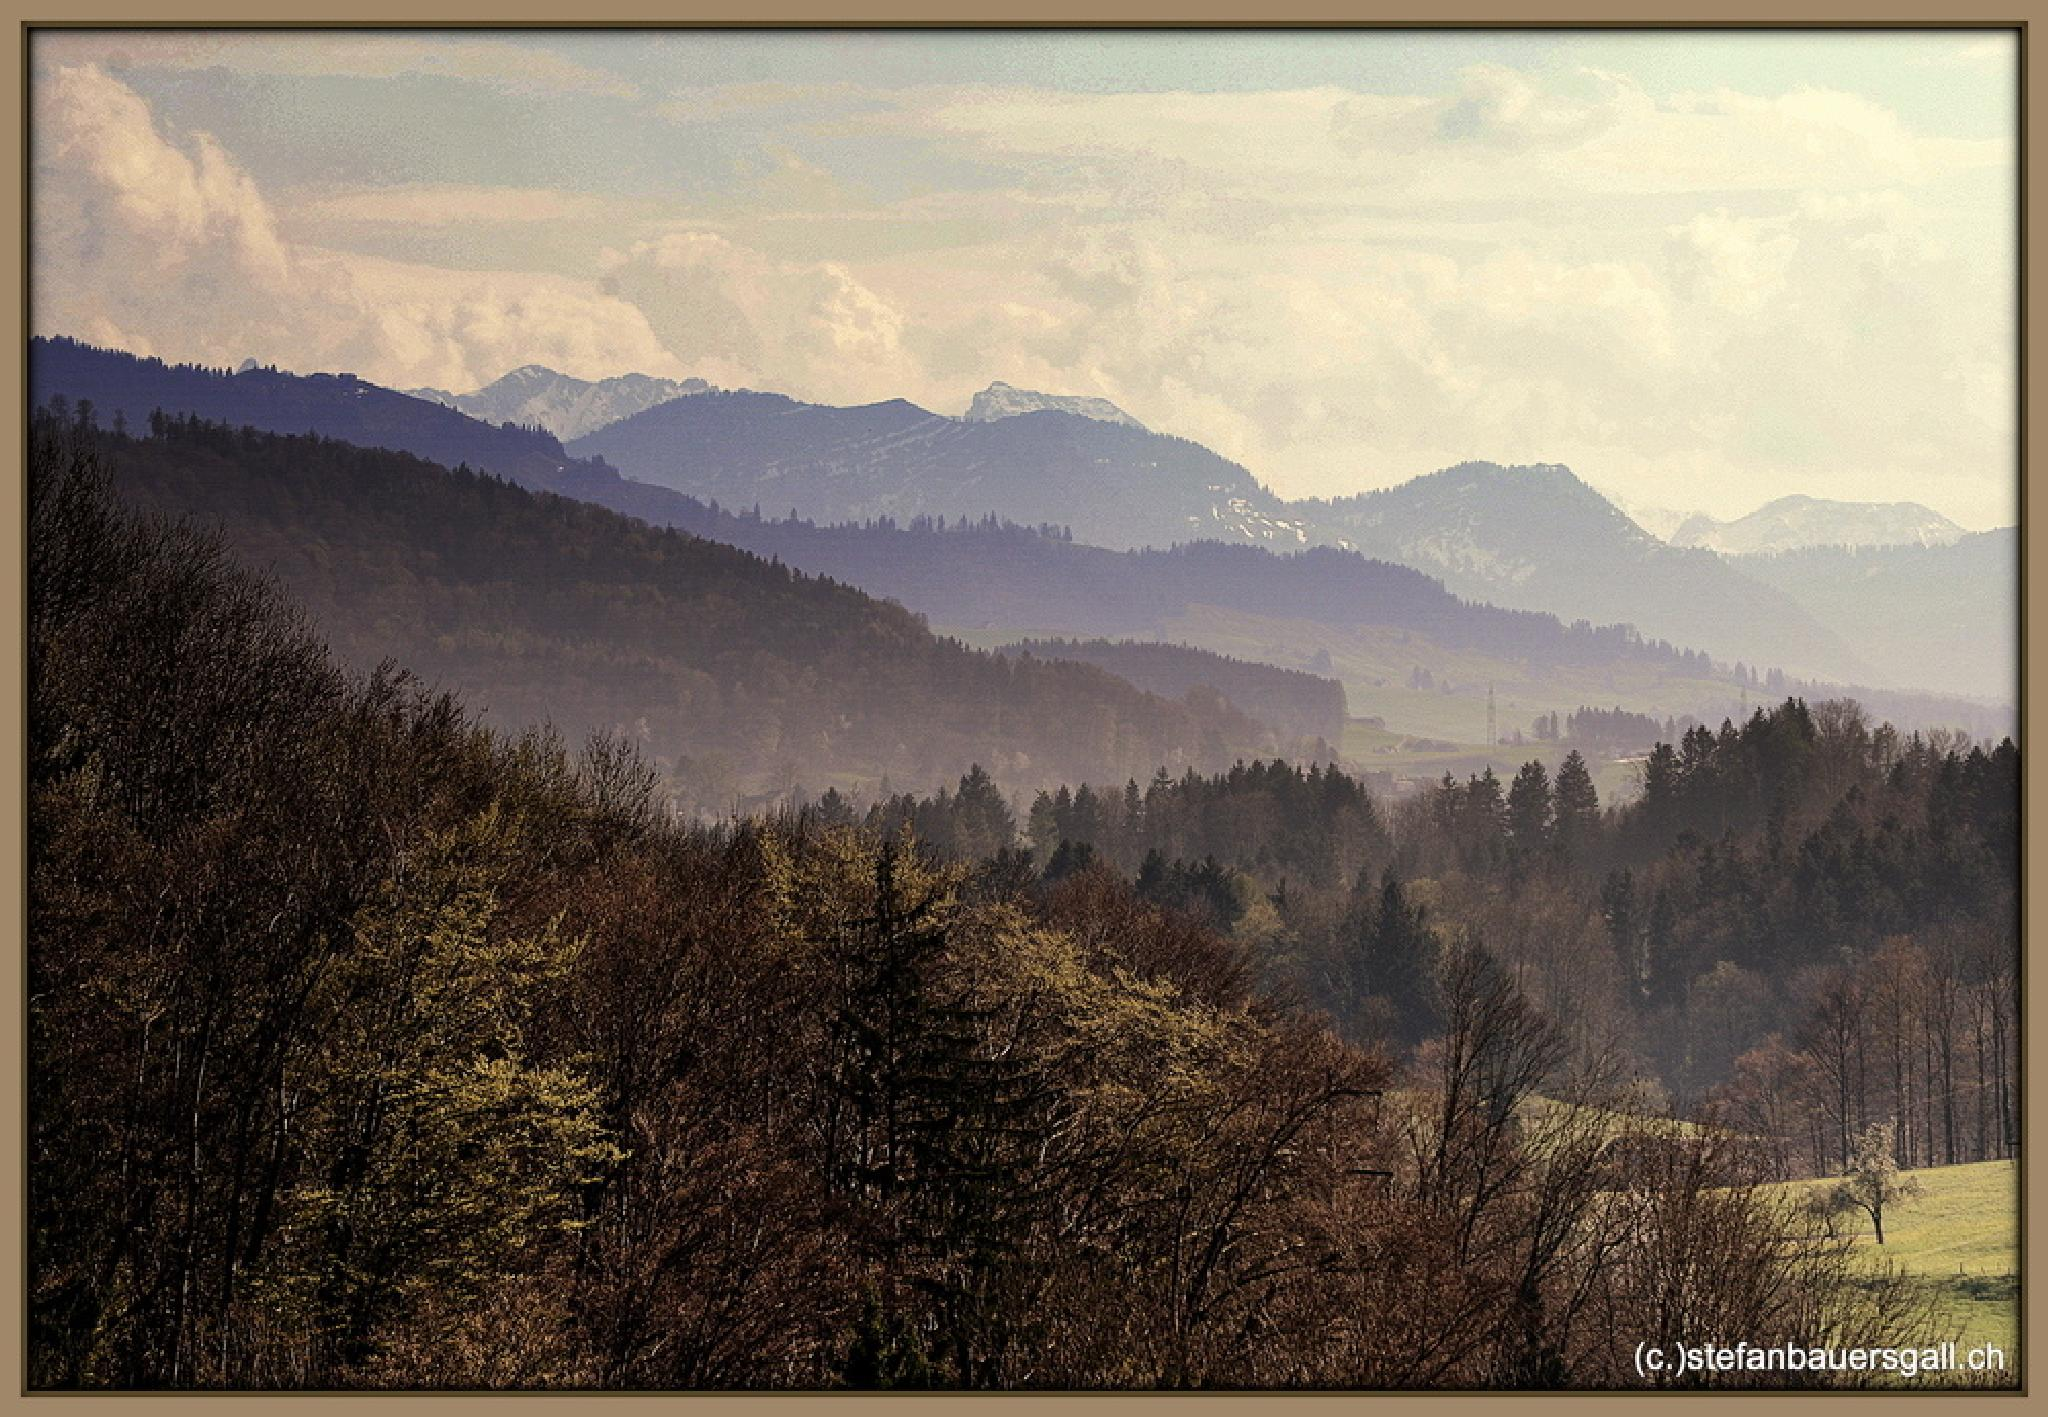 """land of hills."" by BauerStefan"